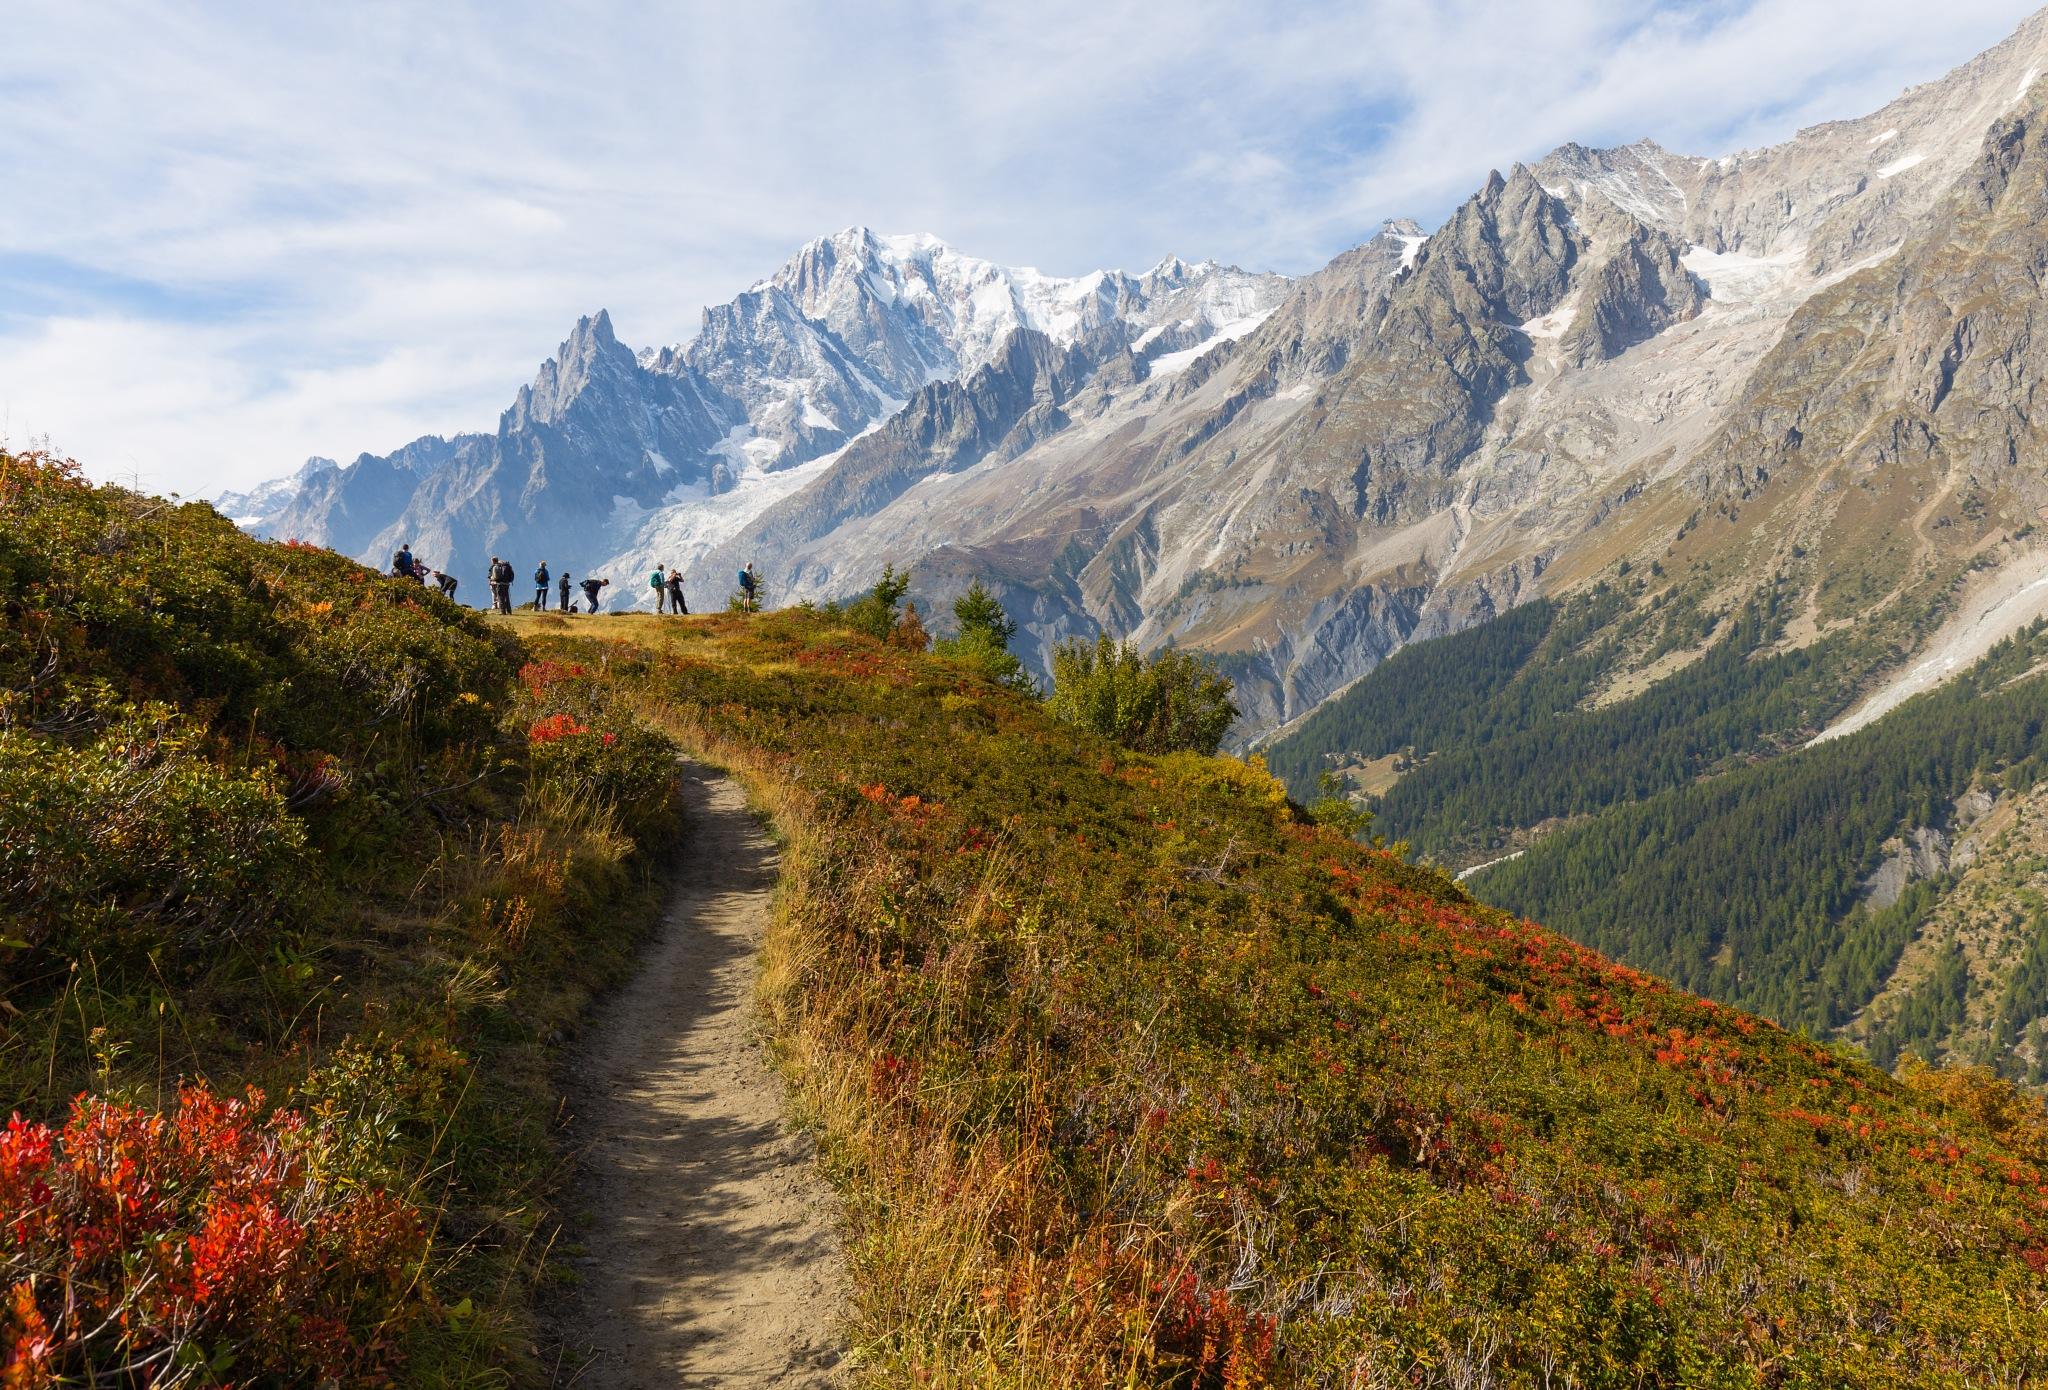 Alpine Rest Stop by Stormrider